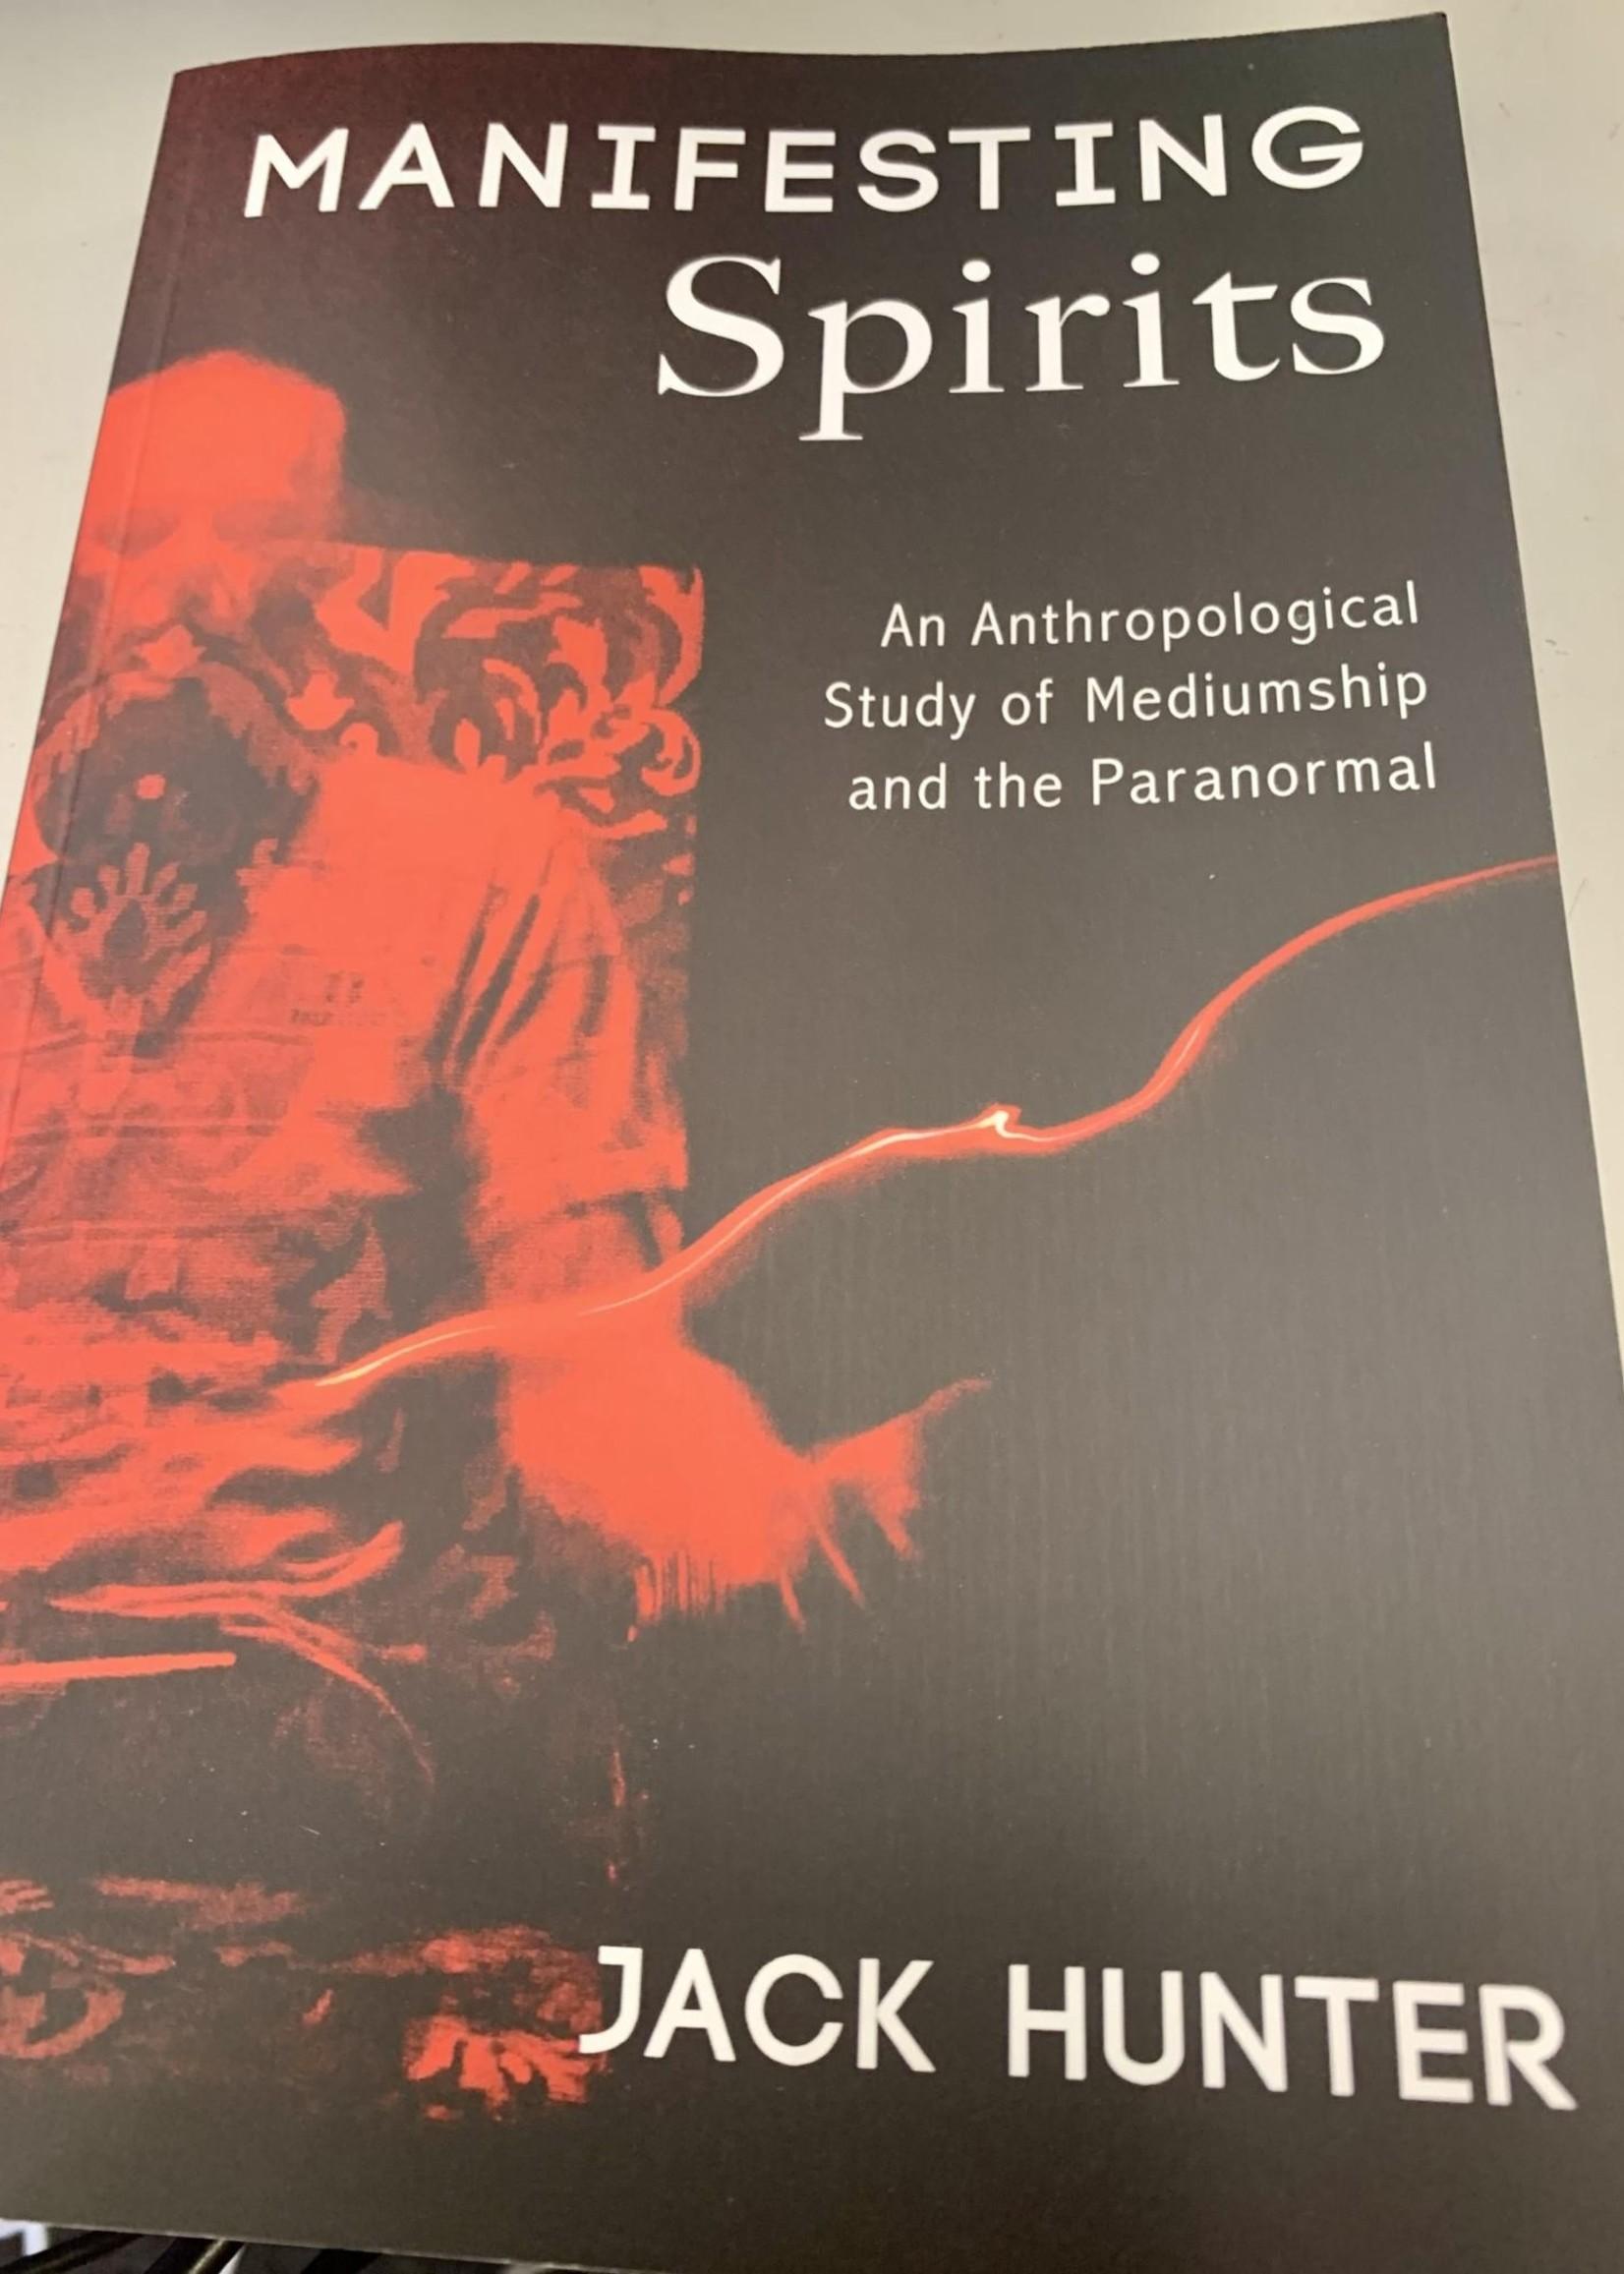 Manifesting Spirits - Jack Hunter